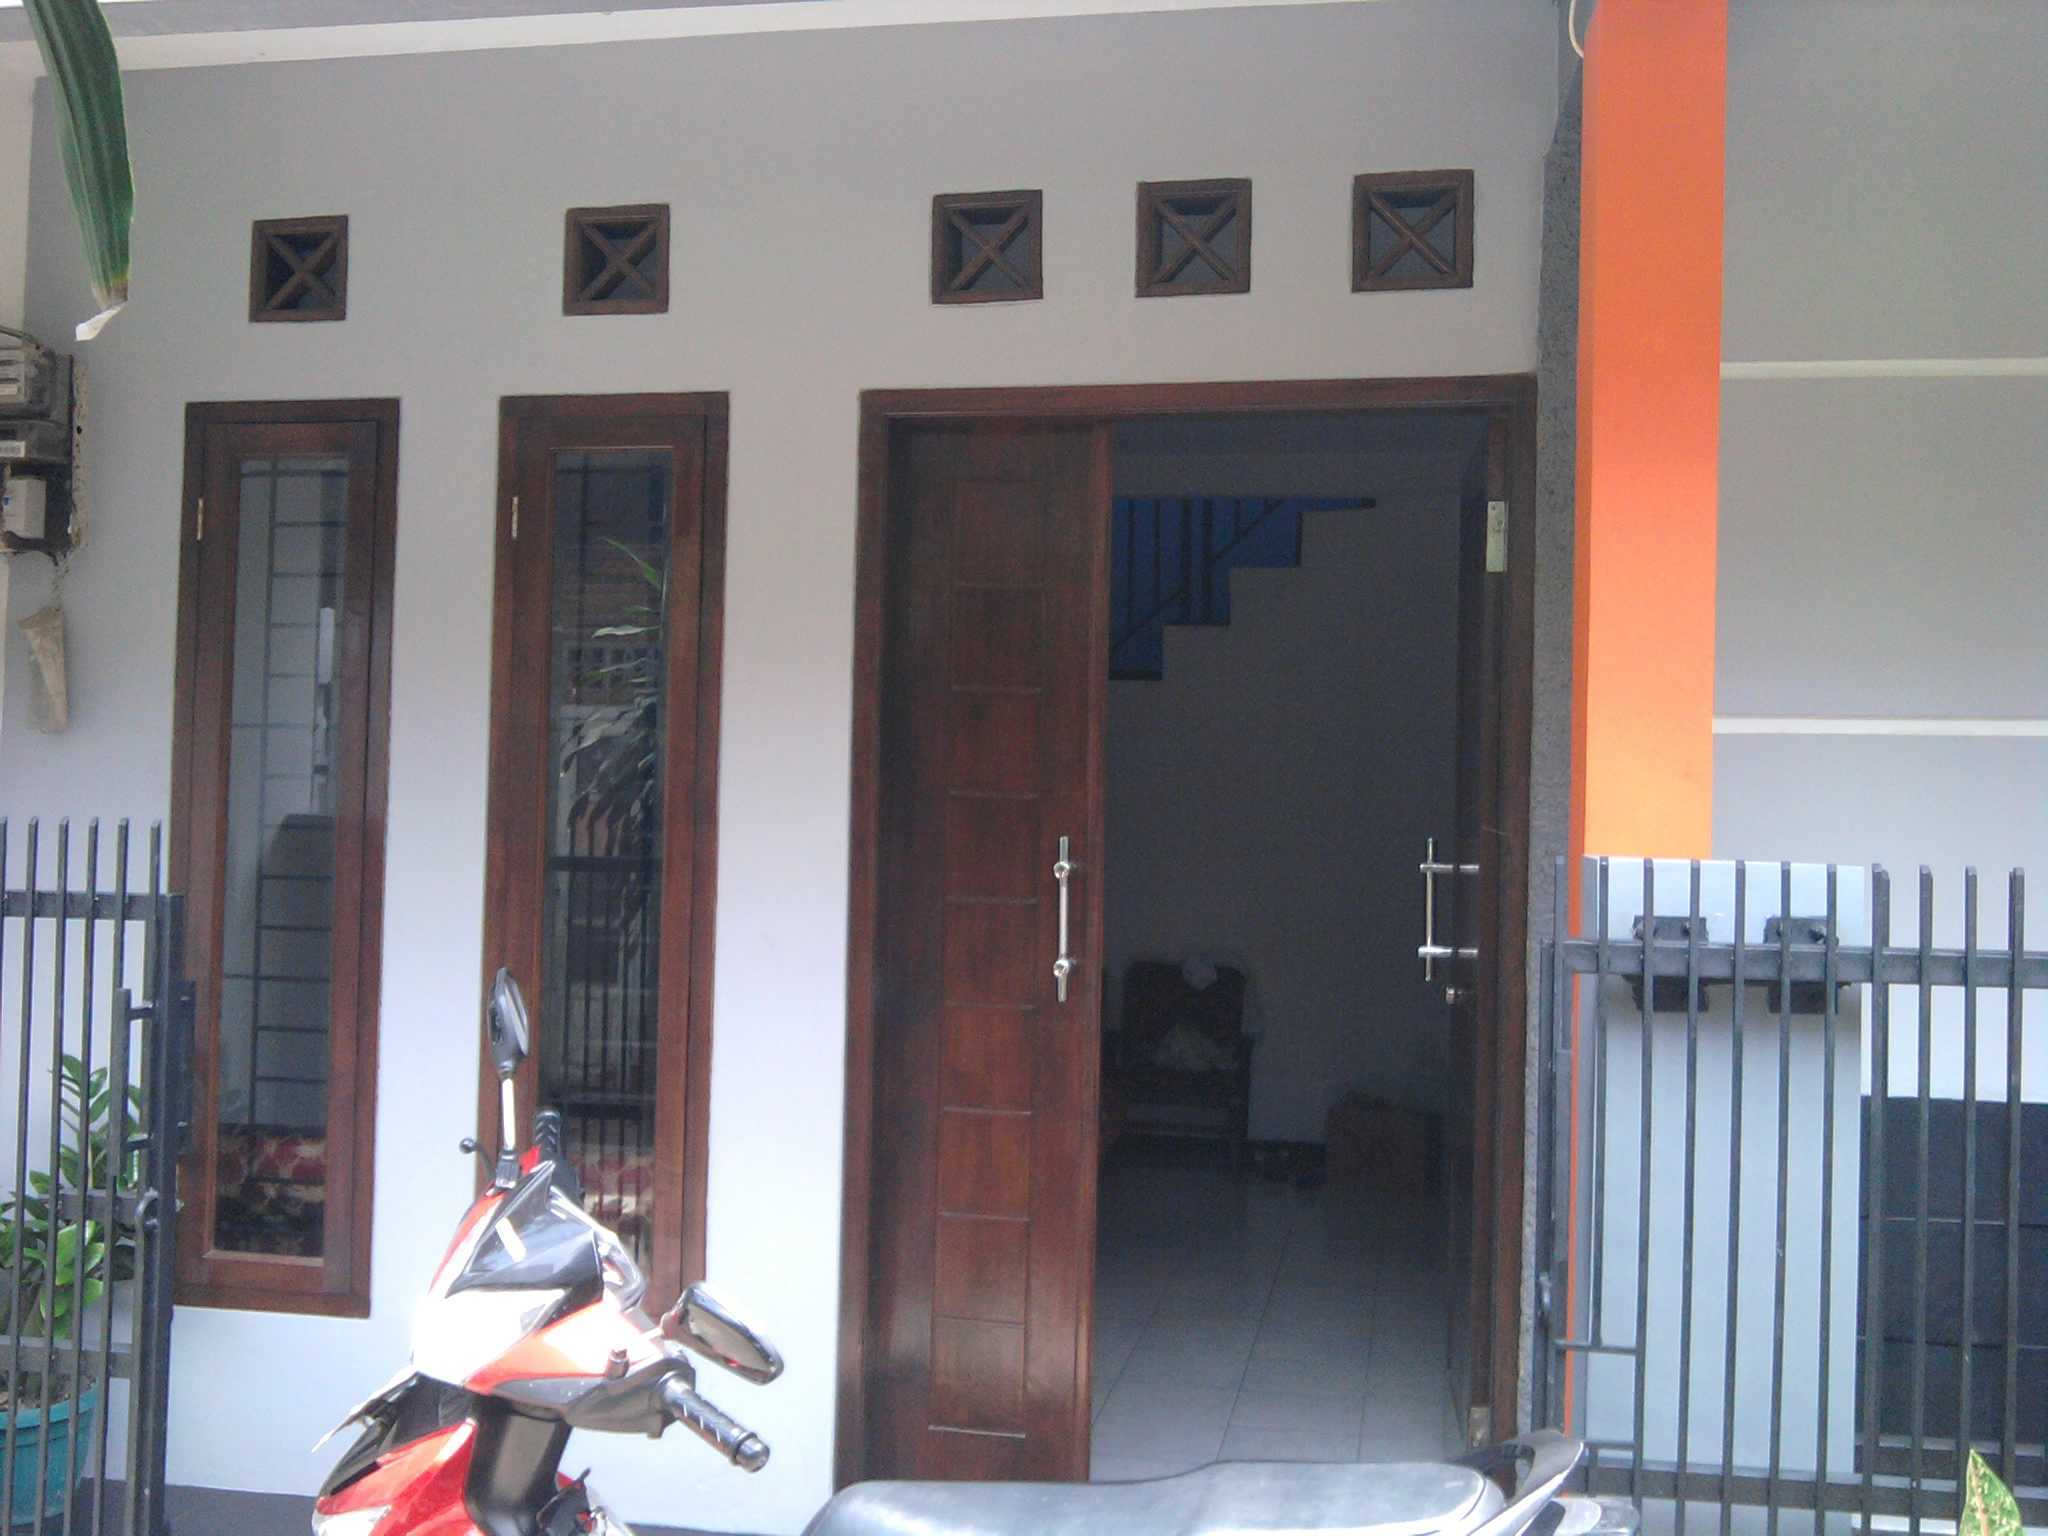 Thoriq & Geger Renovasi Rumah (Modernisasi) - Cipinang Muara Daerah Khusus Ibukota Jakarta, Indonesia Daerah Khusus Ibukota Jakarta, Indonesia Photo0050   37722